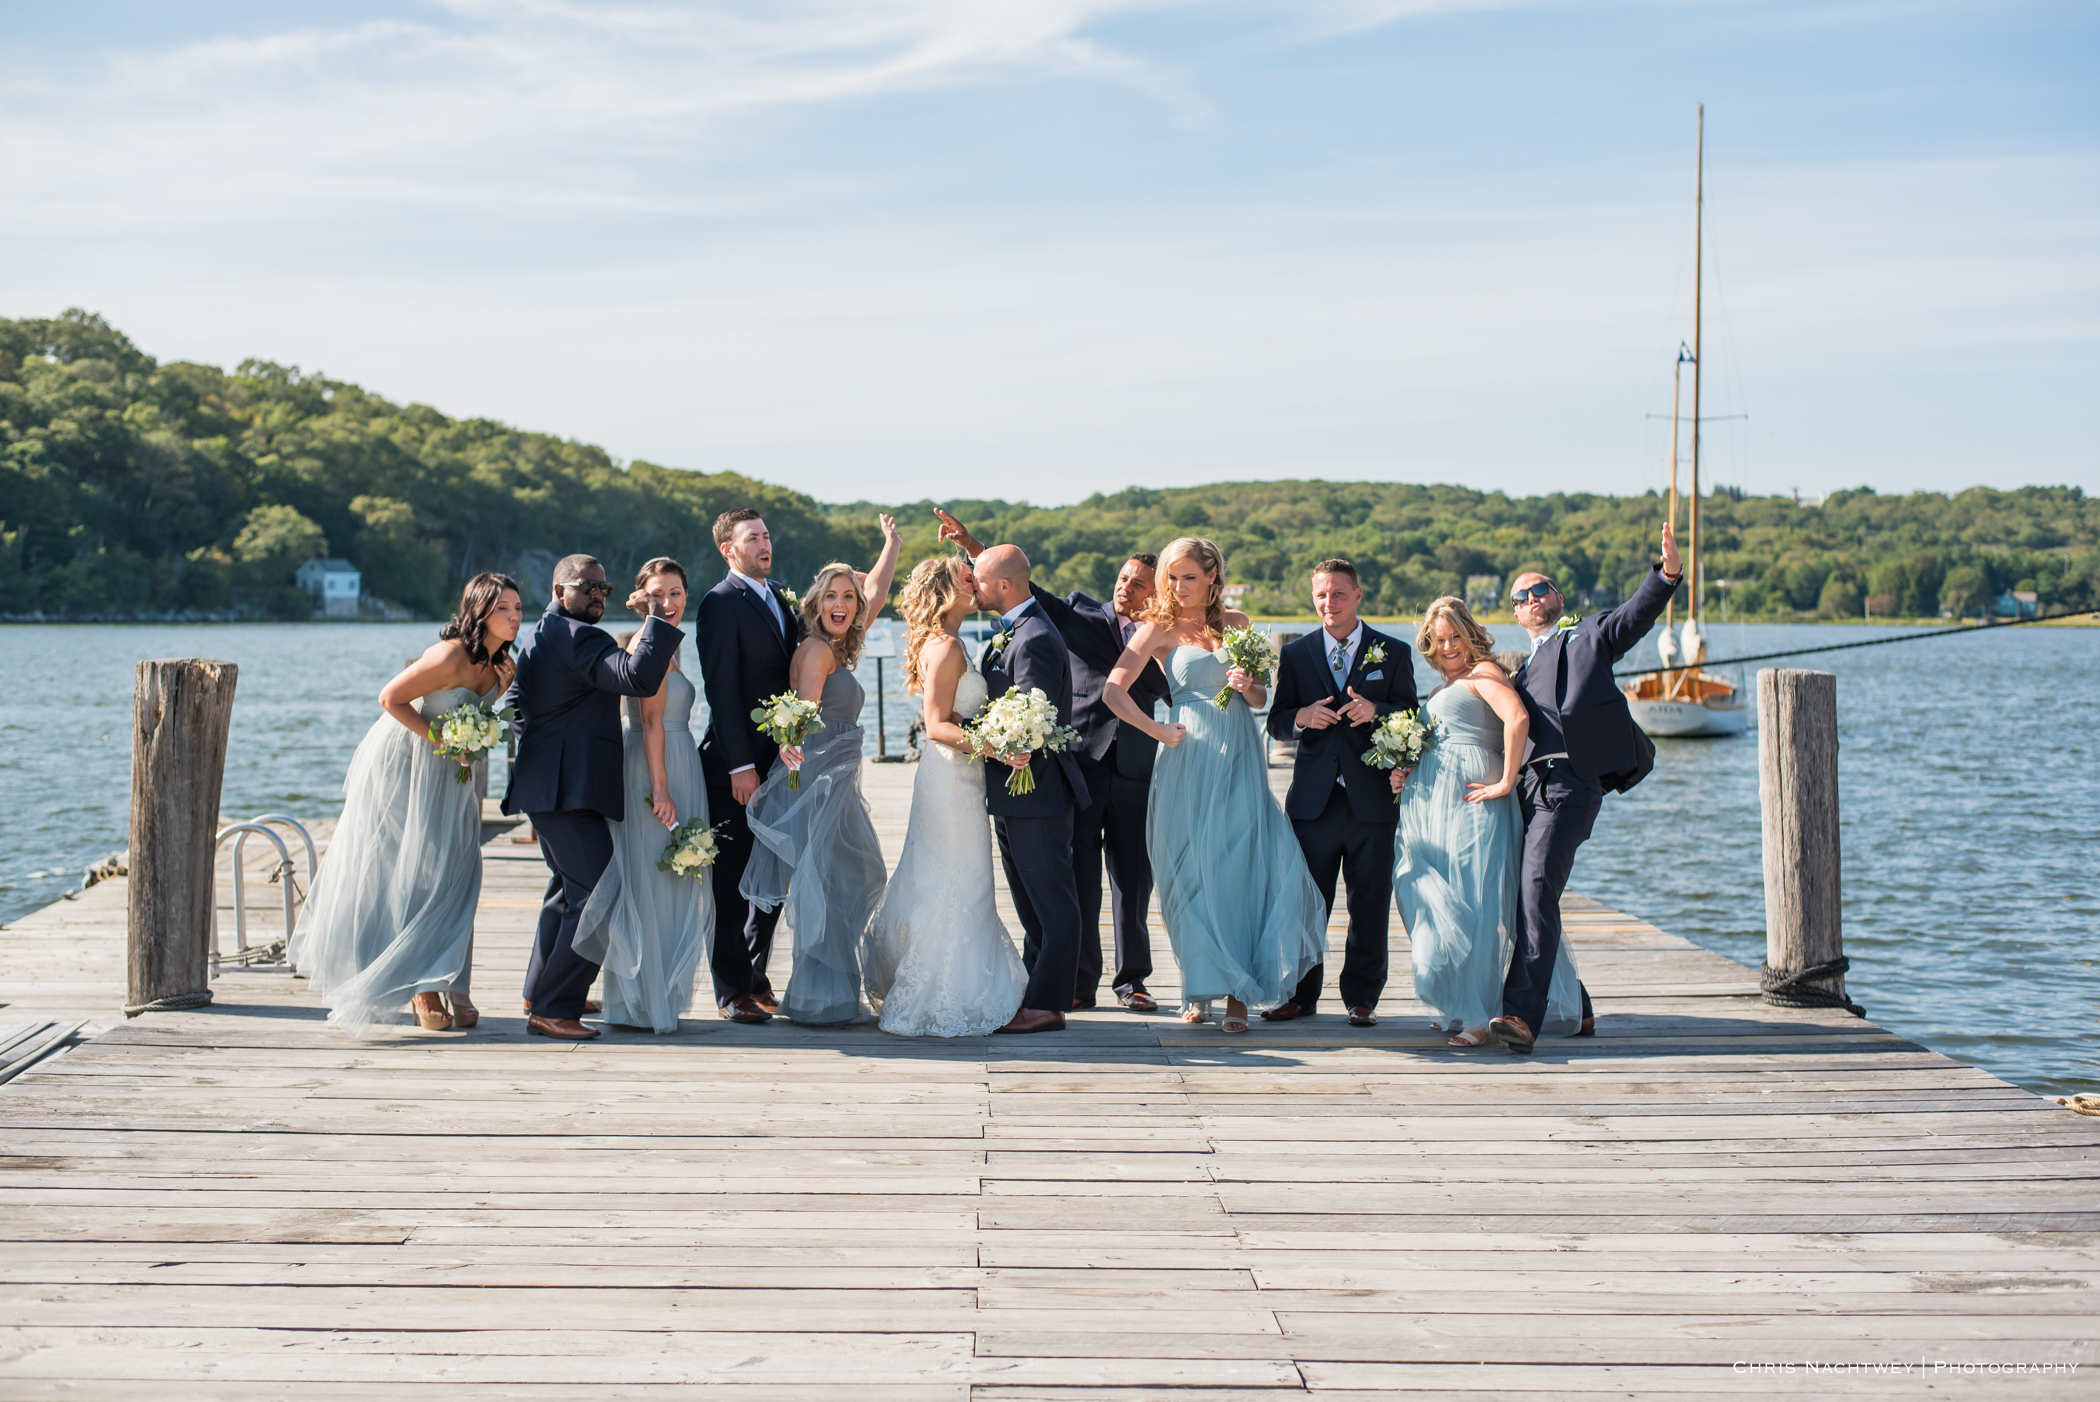 mystic-ct-artistic-wedding-photographers-chris-nachtwey-tany-mike-2017-13.jpg